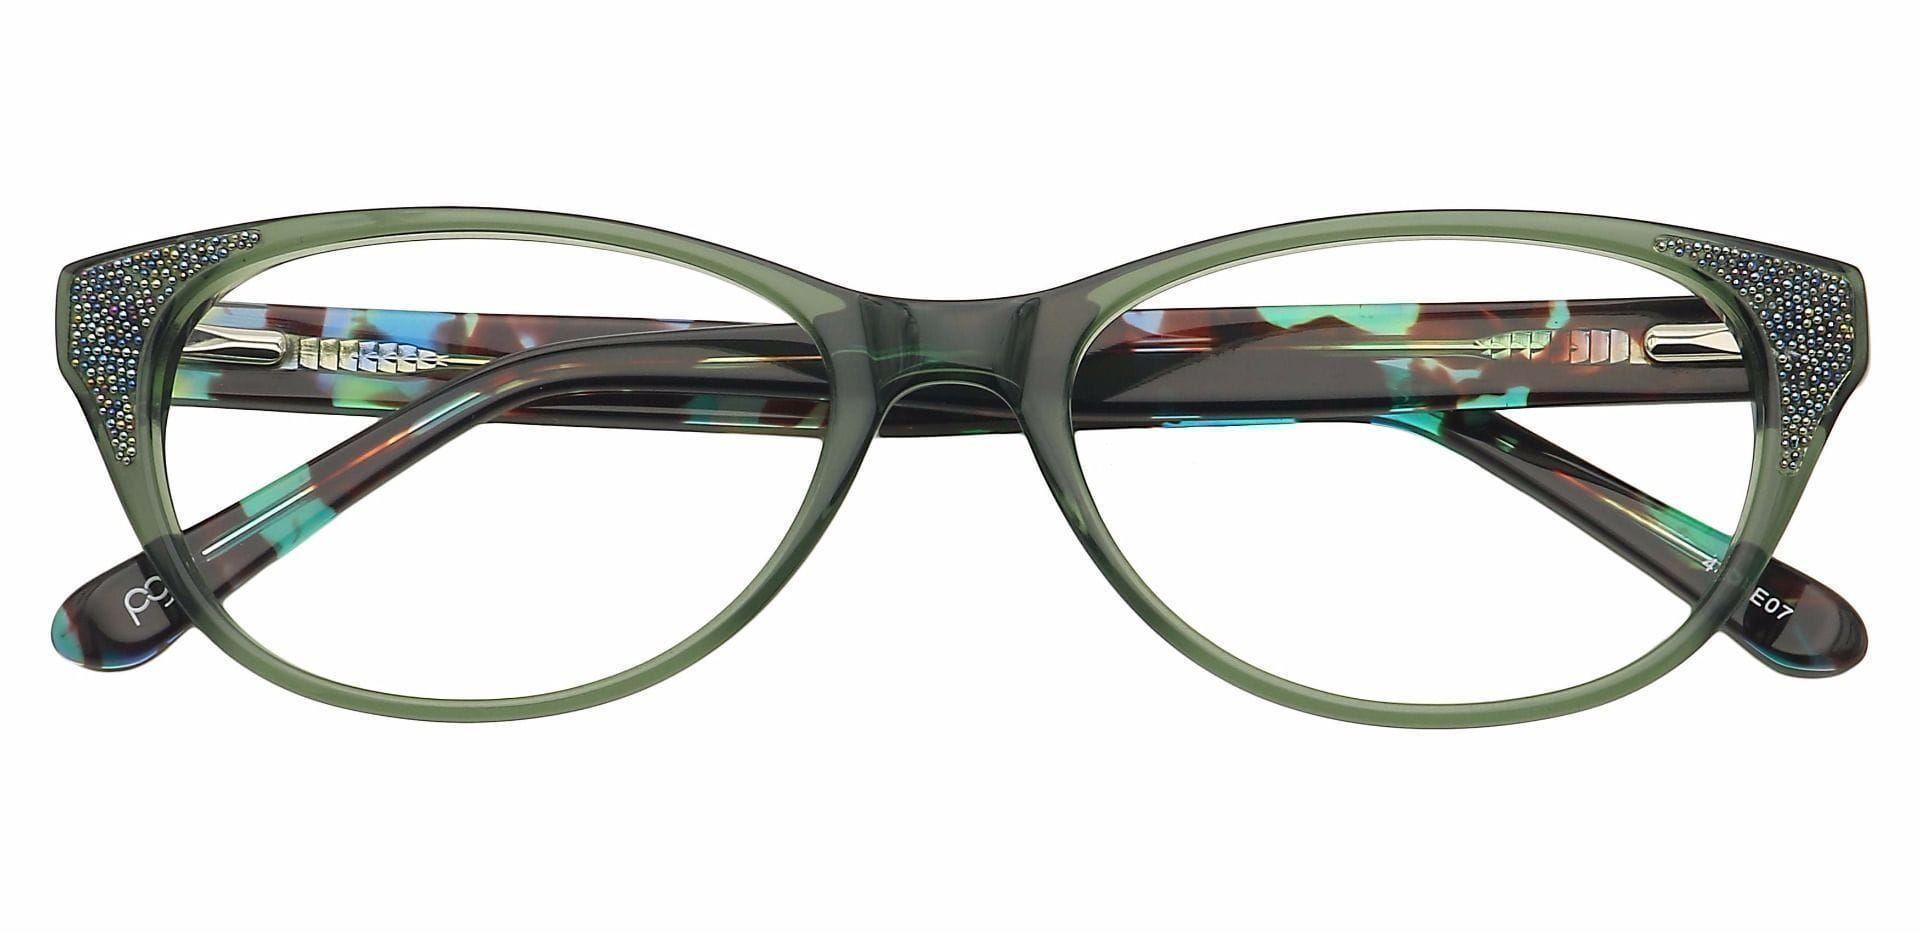 Rae Oval Blue Light Blocking Glasses - Green